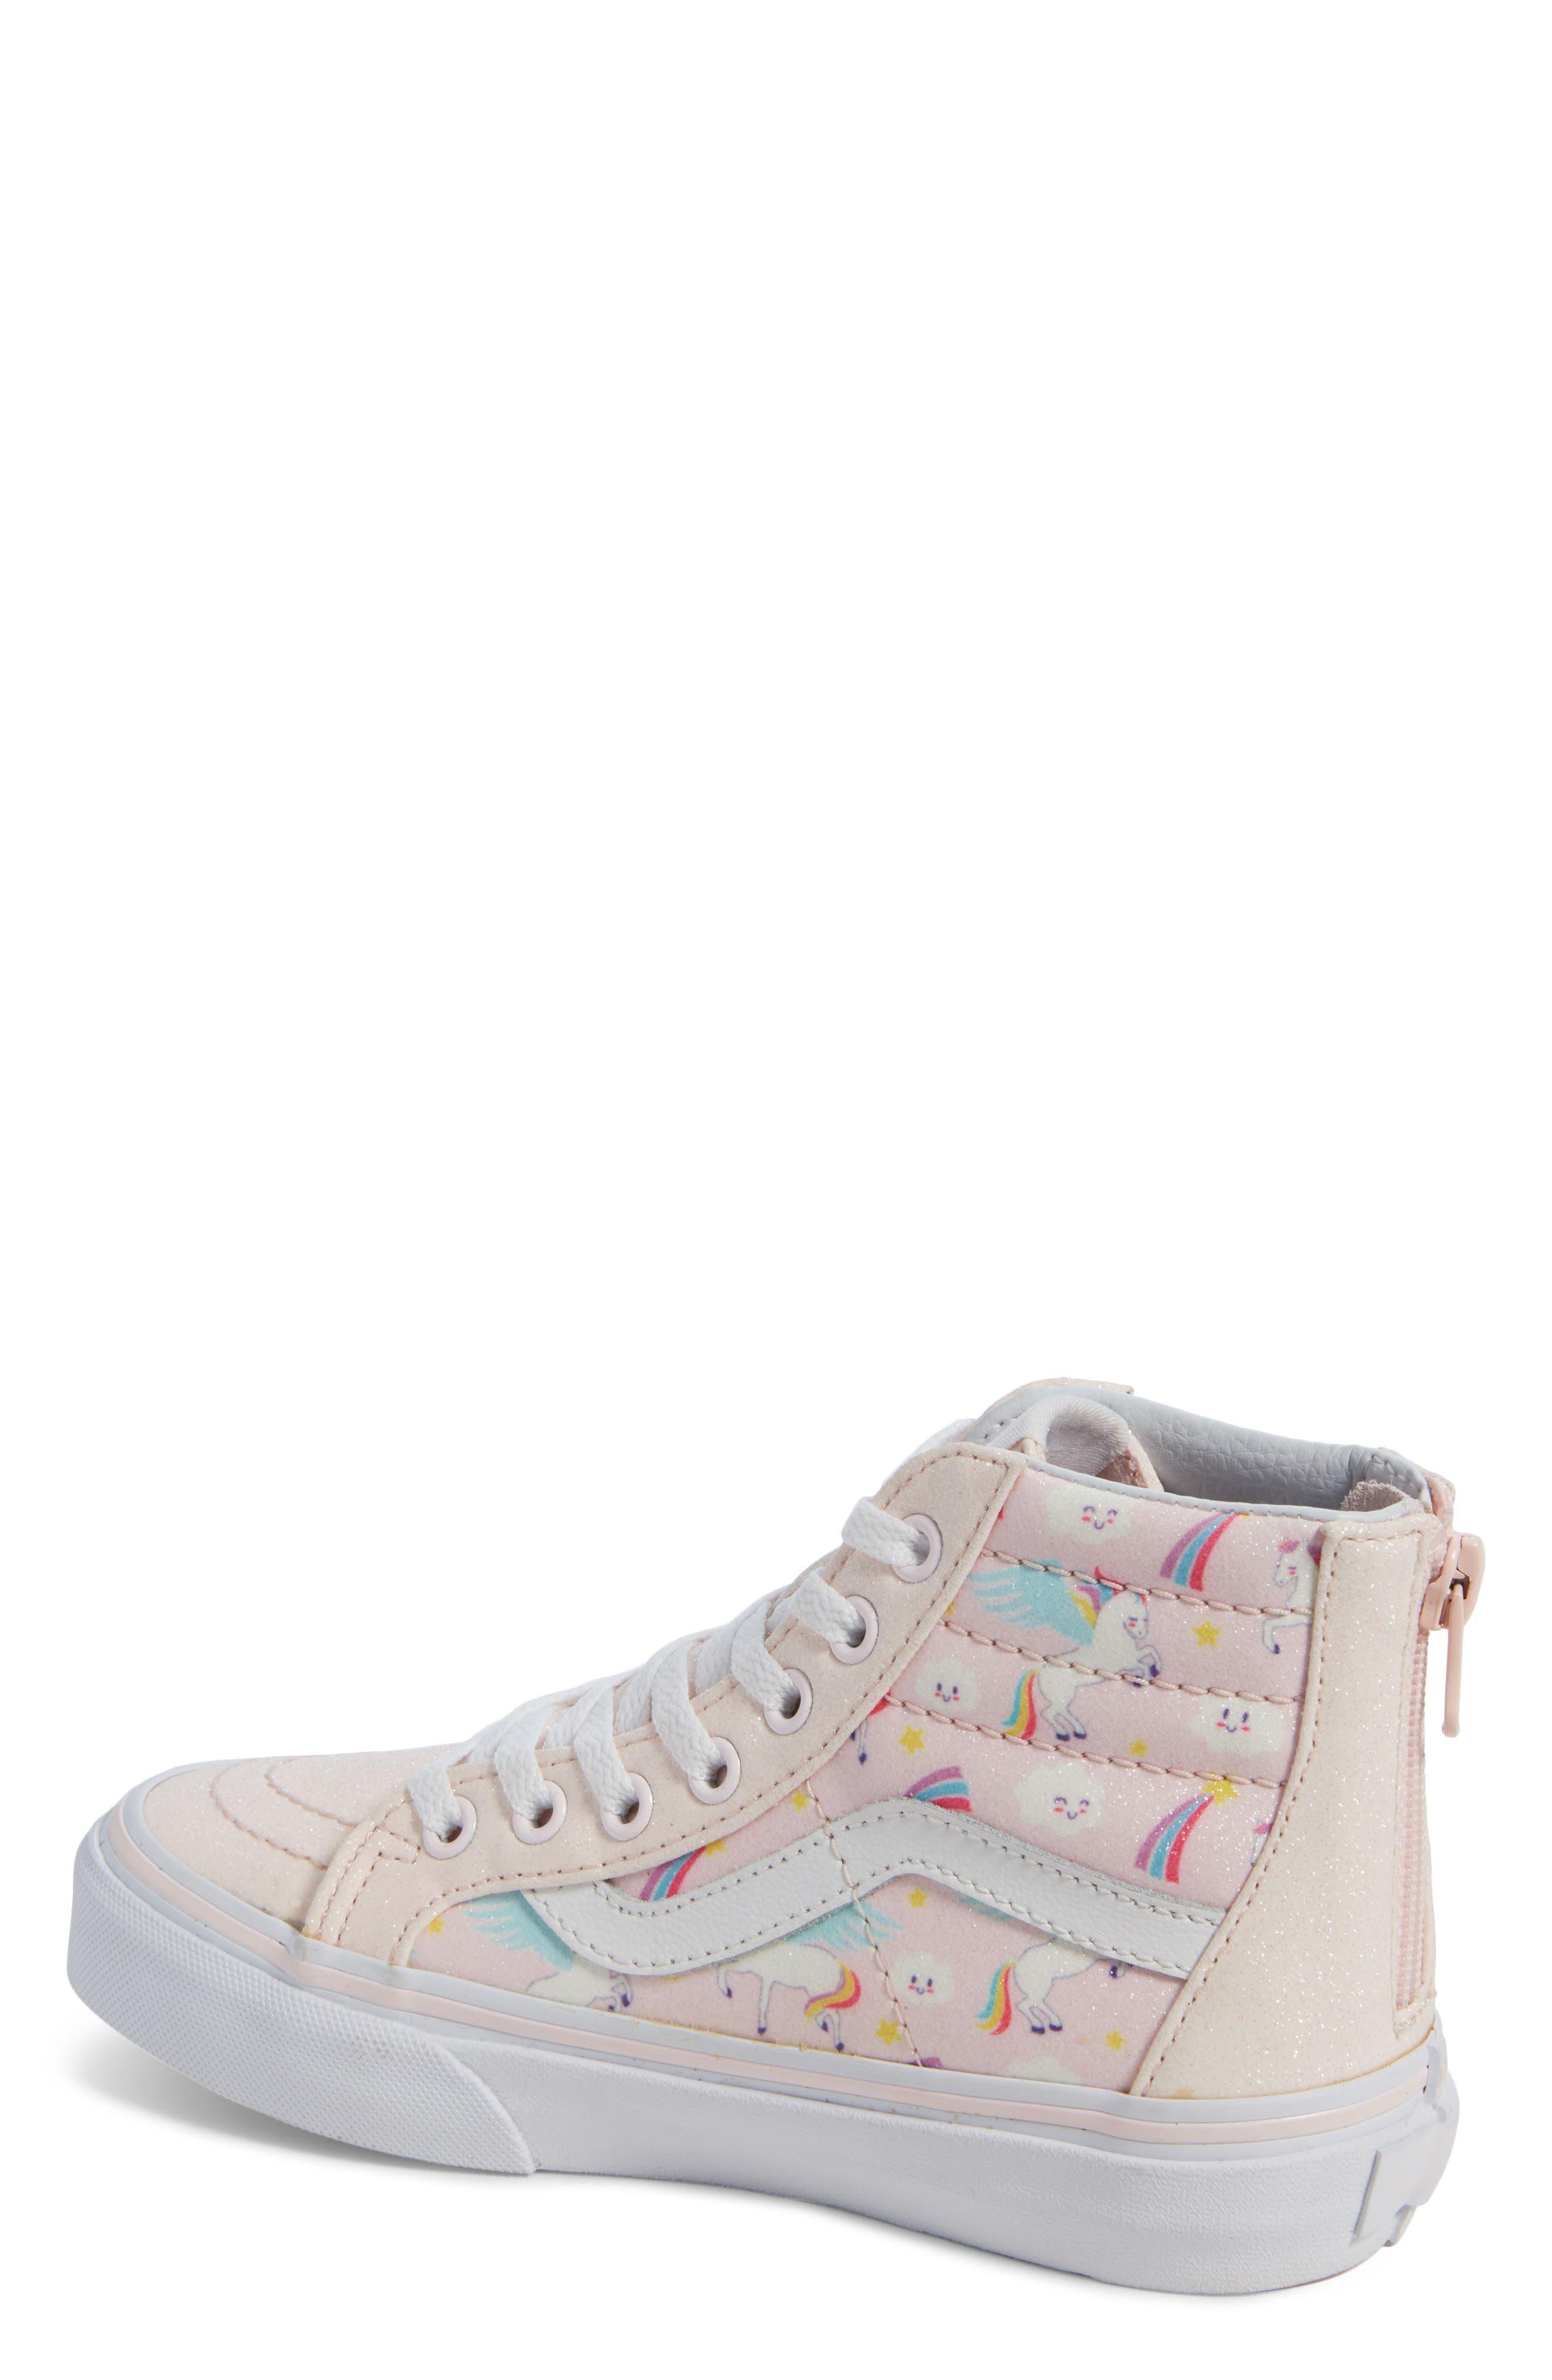 Sk8-Hi Zip Sneaker,                             Alternate thumbnail 2, color,                             GLITTER PEGASUS PINK/ WHITE